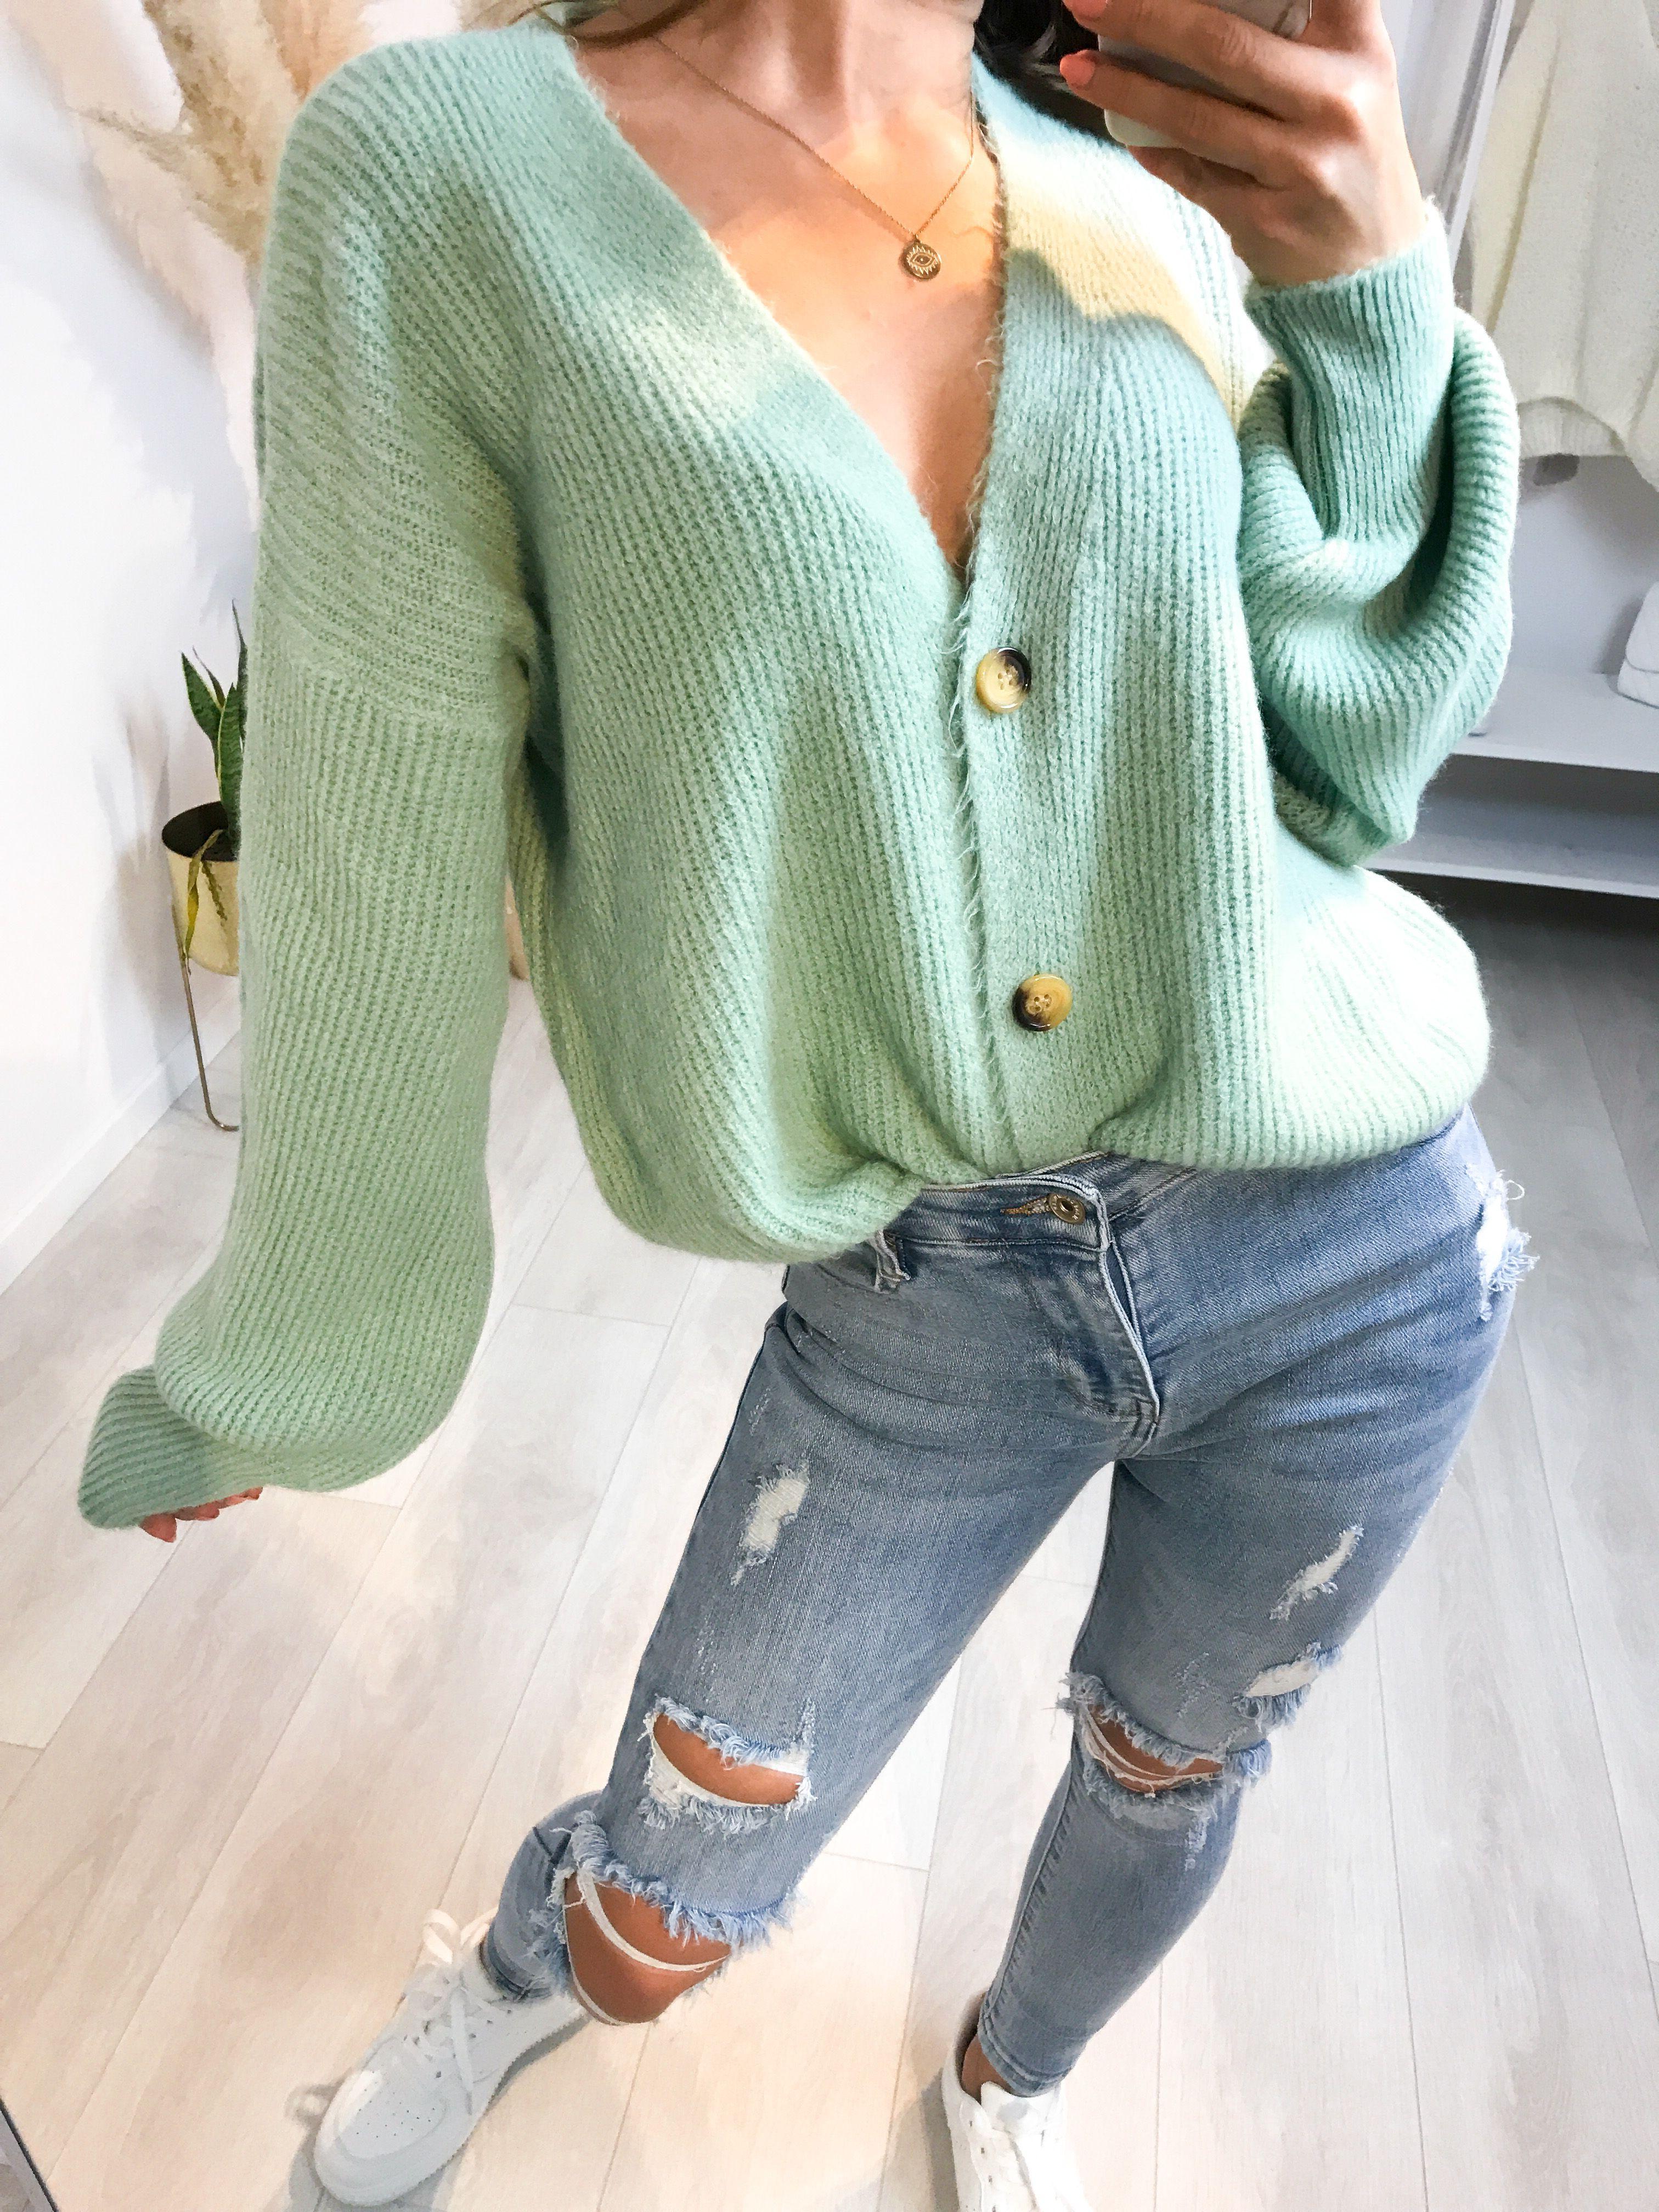 Damen V-Ausschnitt Knöpfe Strickjacke Pullover Pulli Outwear Blusen Jacke Mantel